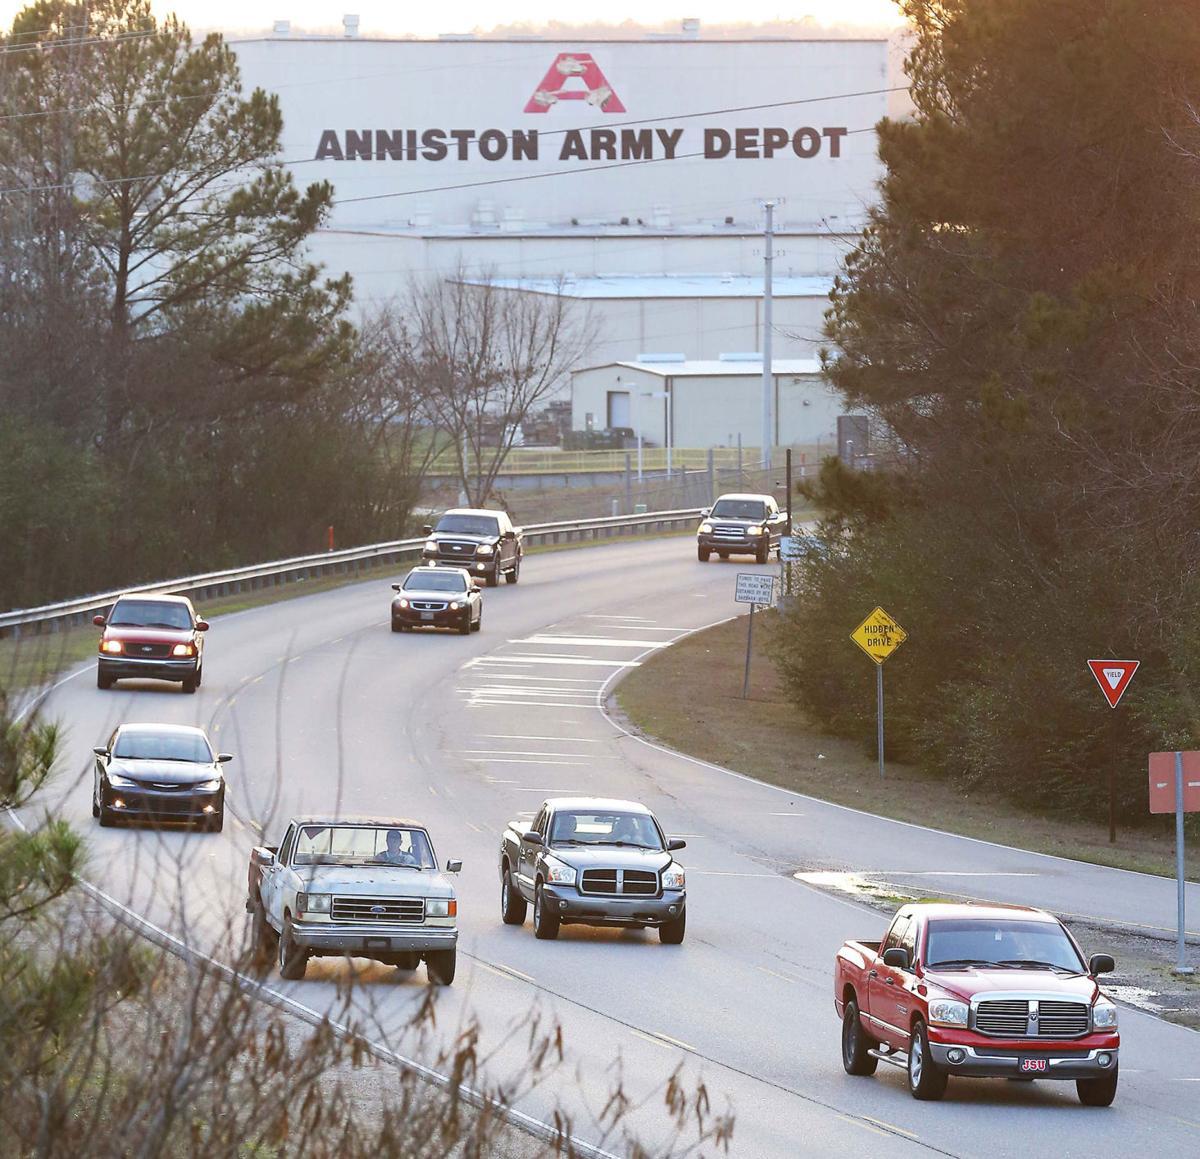 Anniston Army Depot traffic (copy)